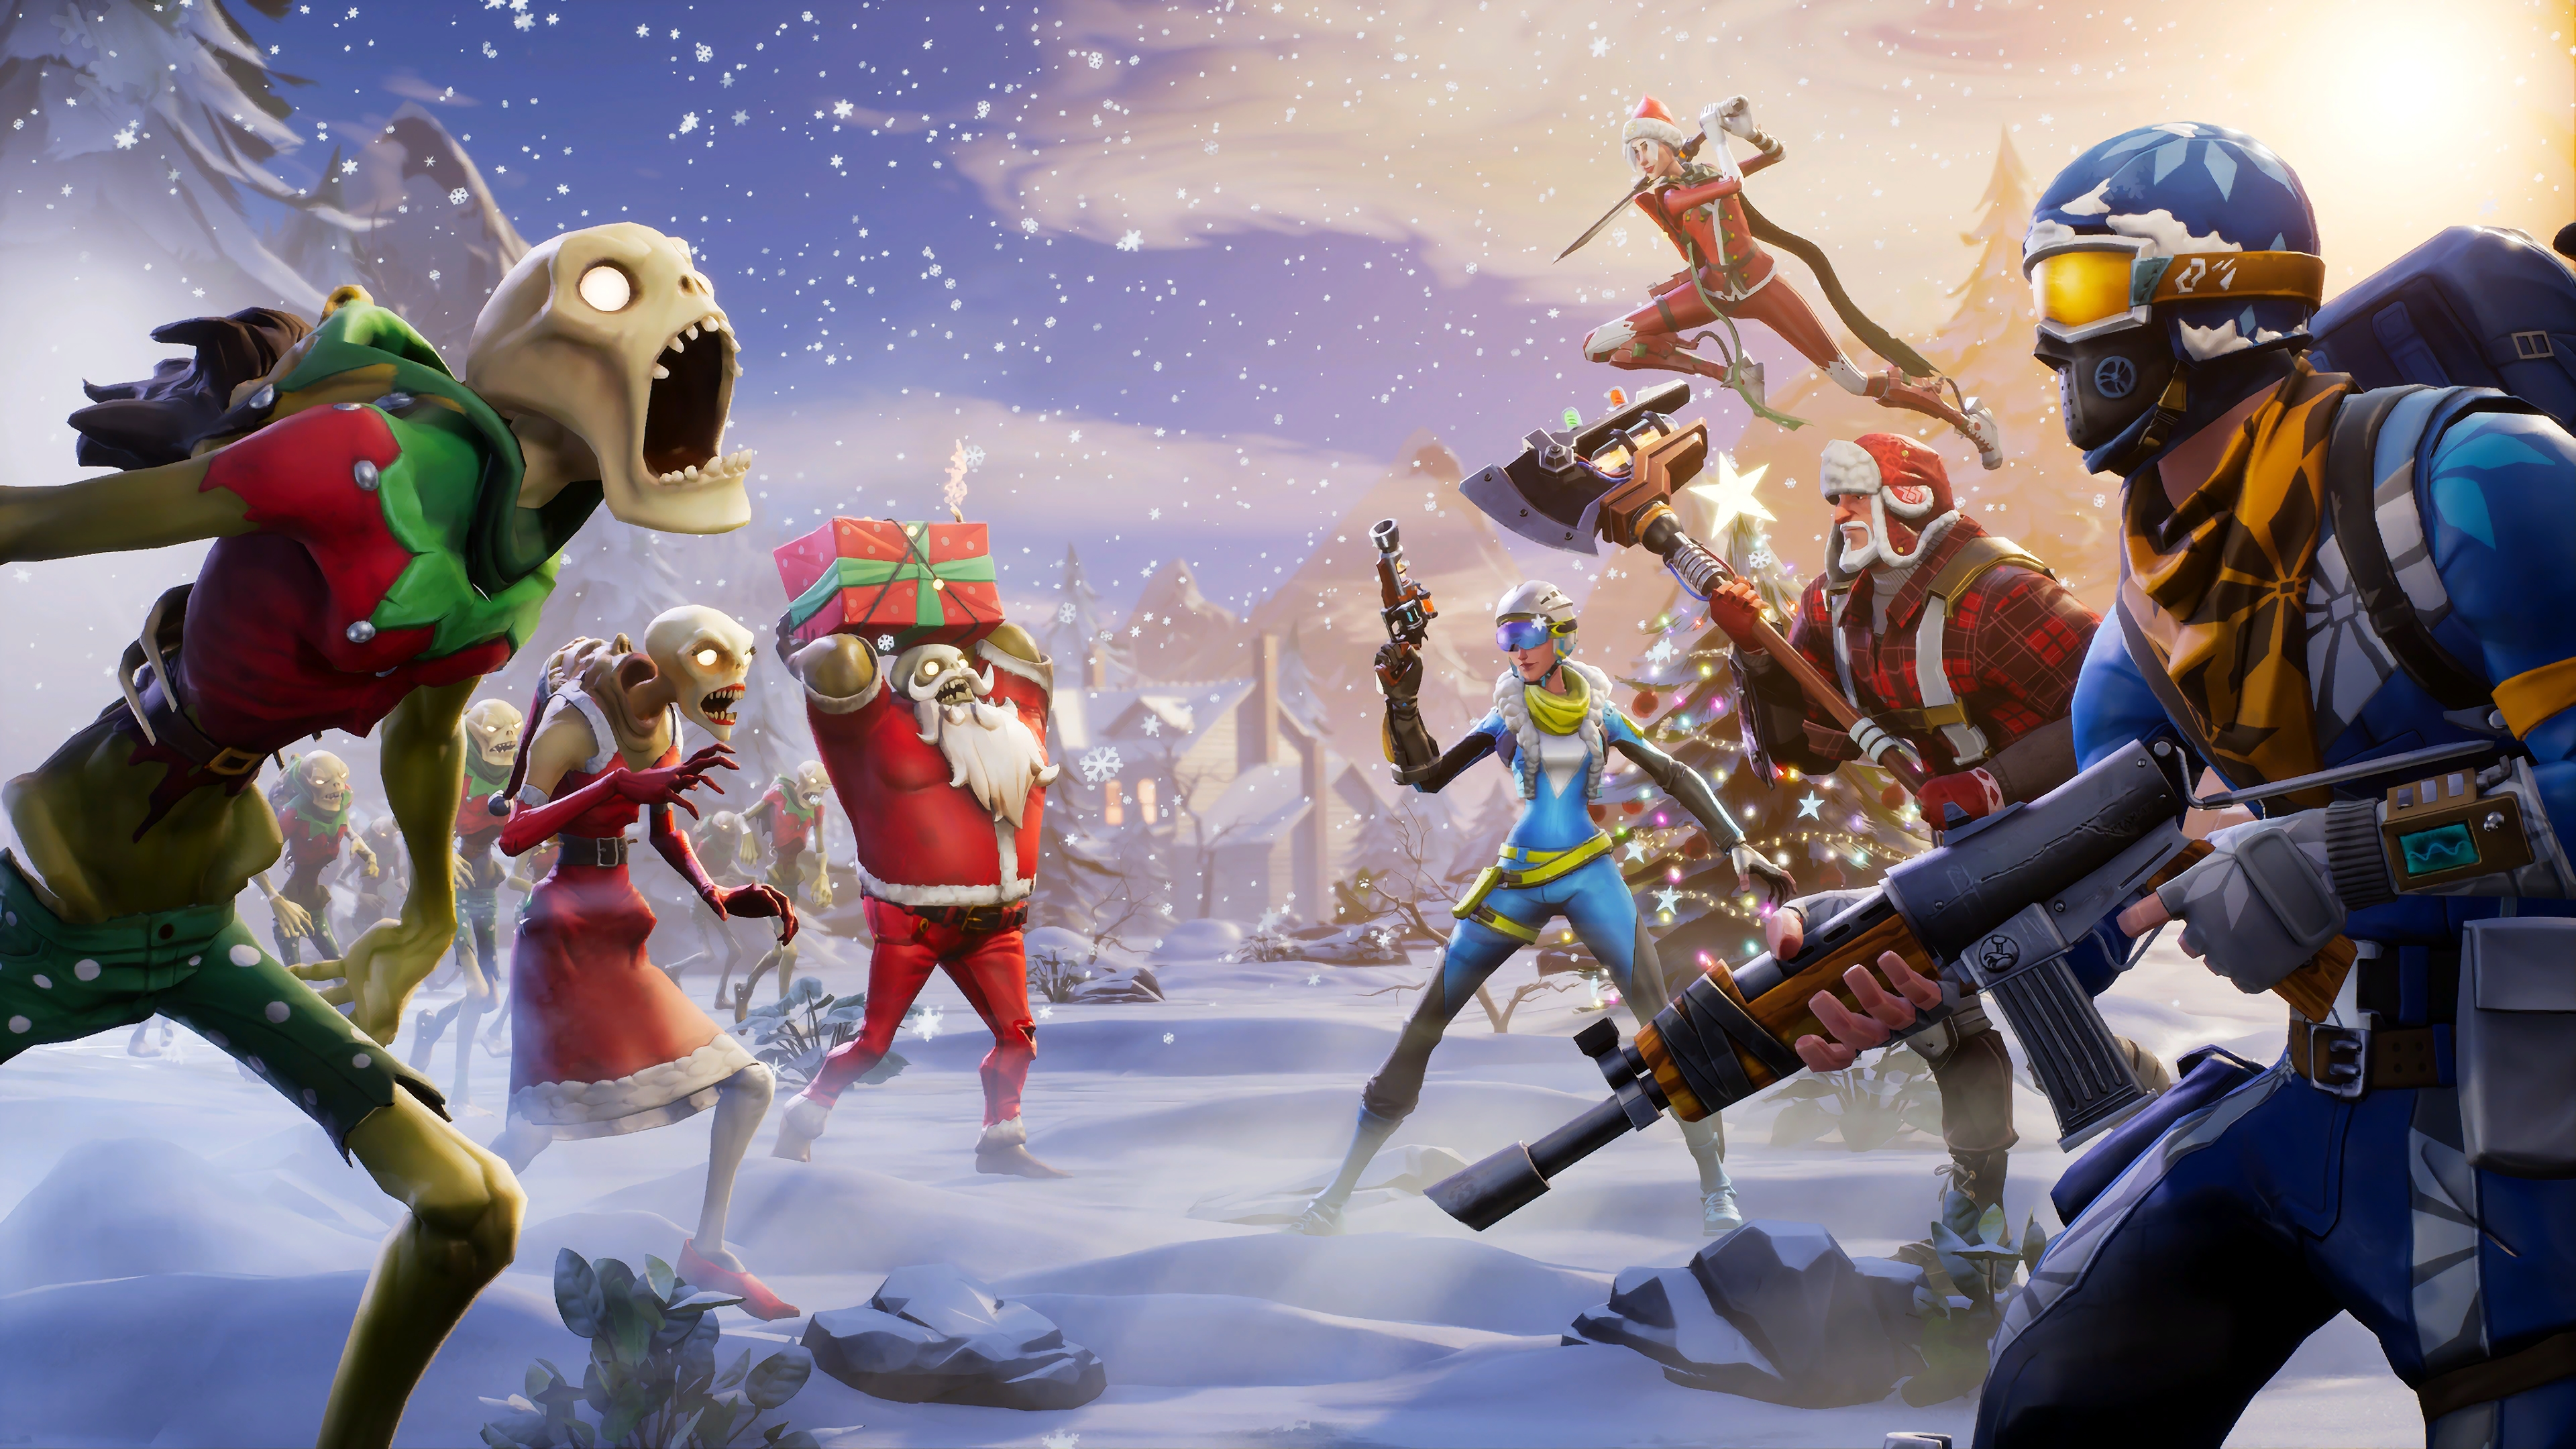 Fortnite Winter Season, HD Games, 4k Wallpapers, Images ...